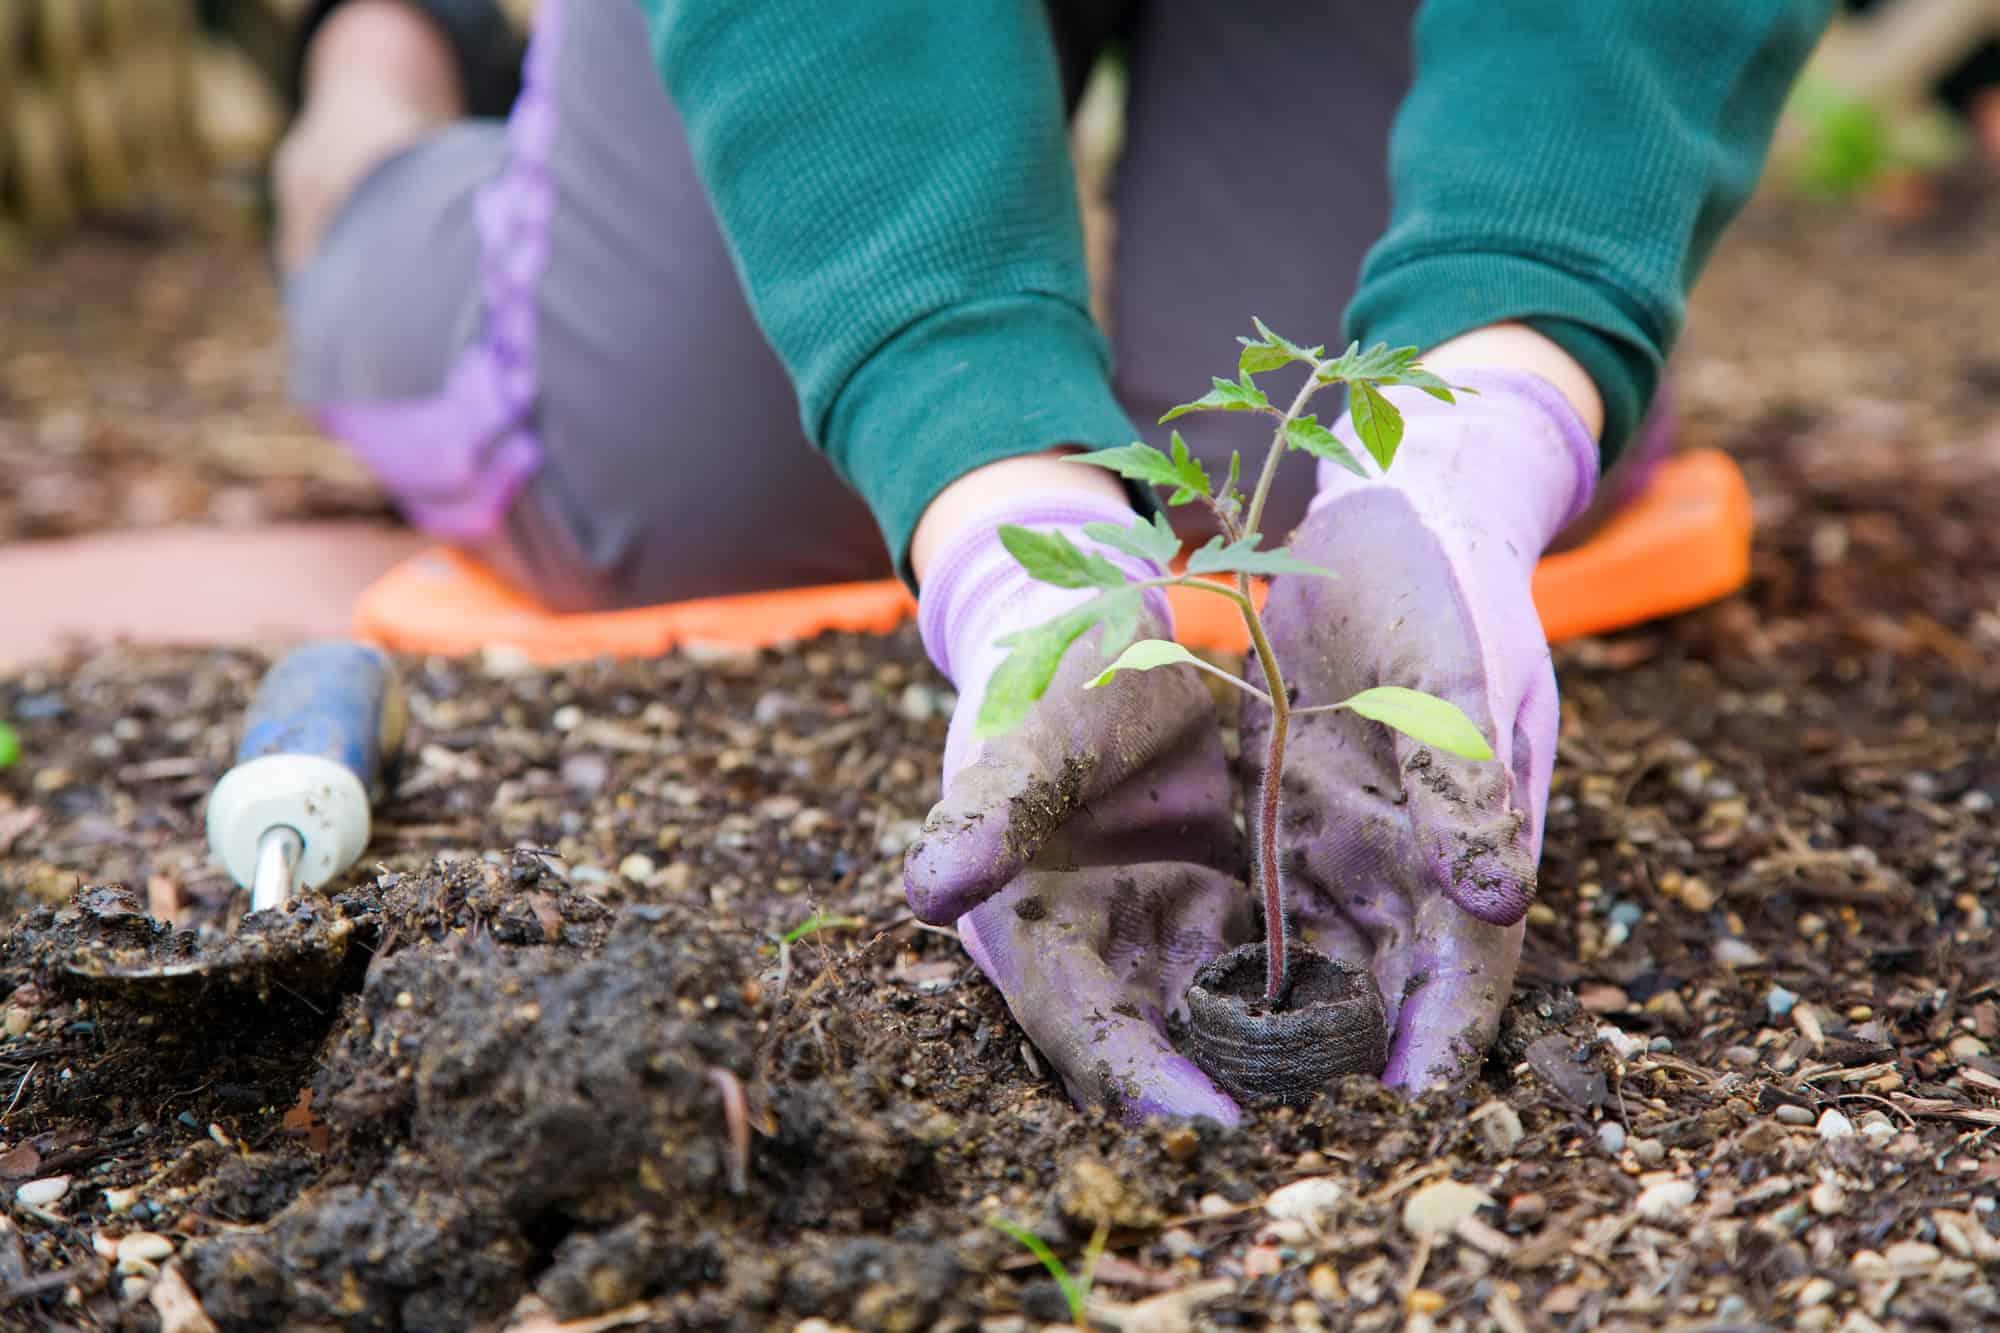 gardening gloves planting tomato